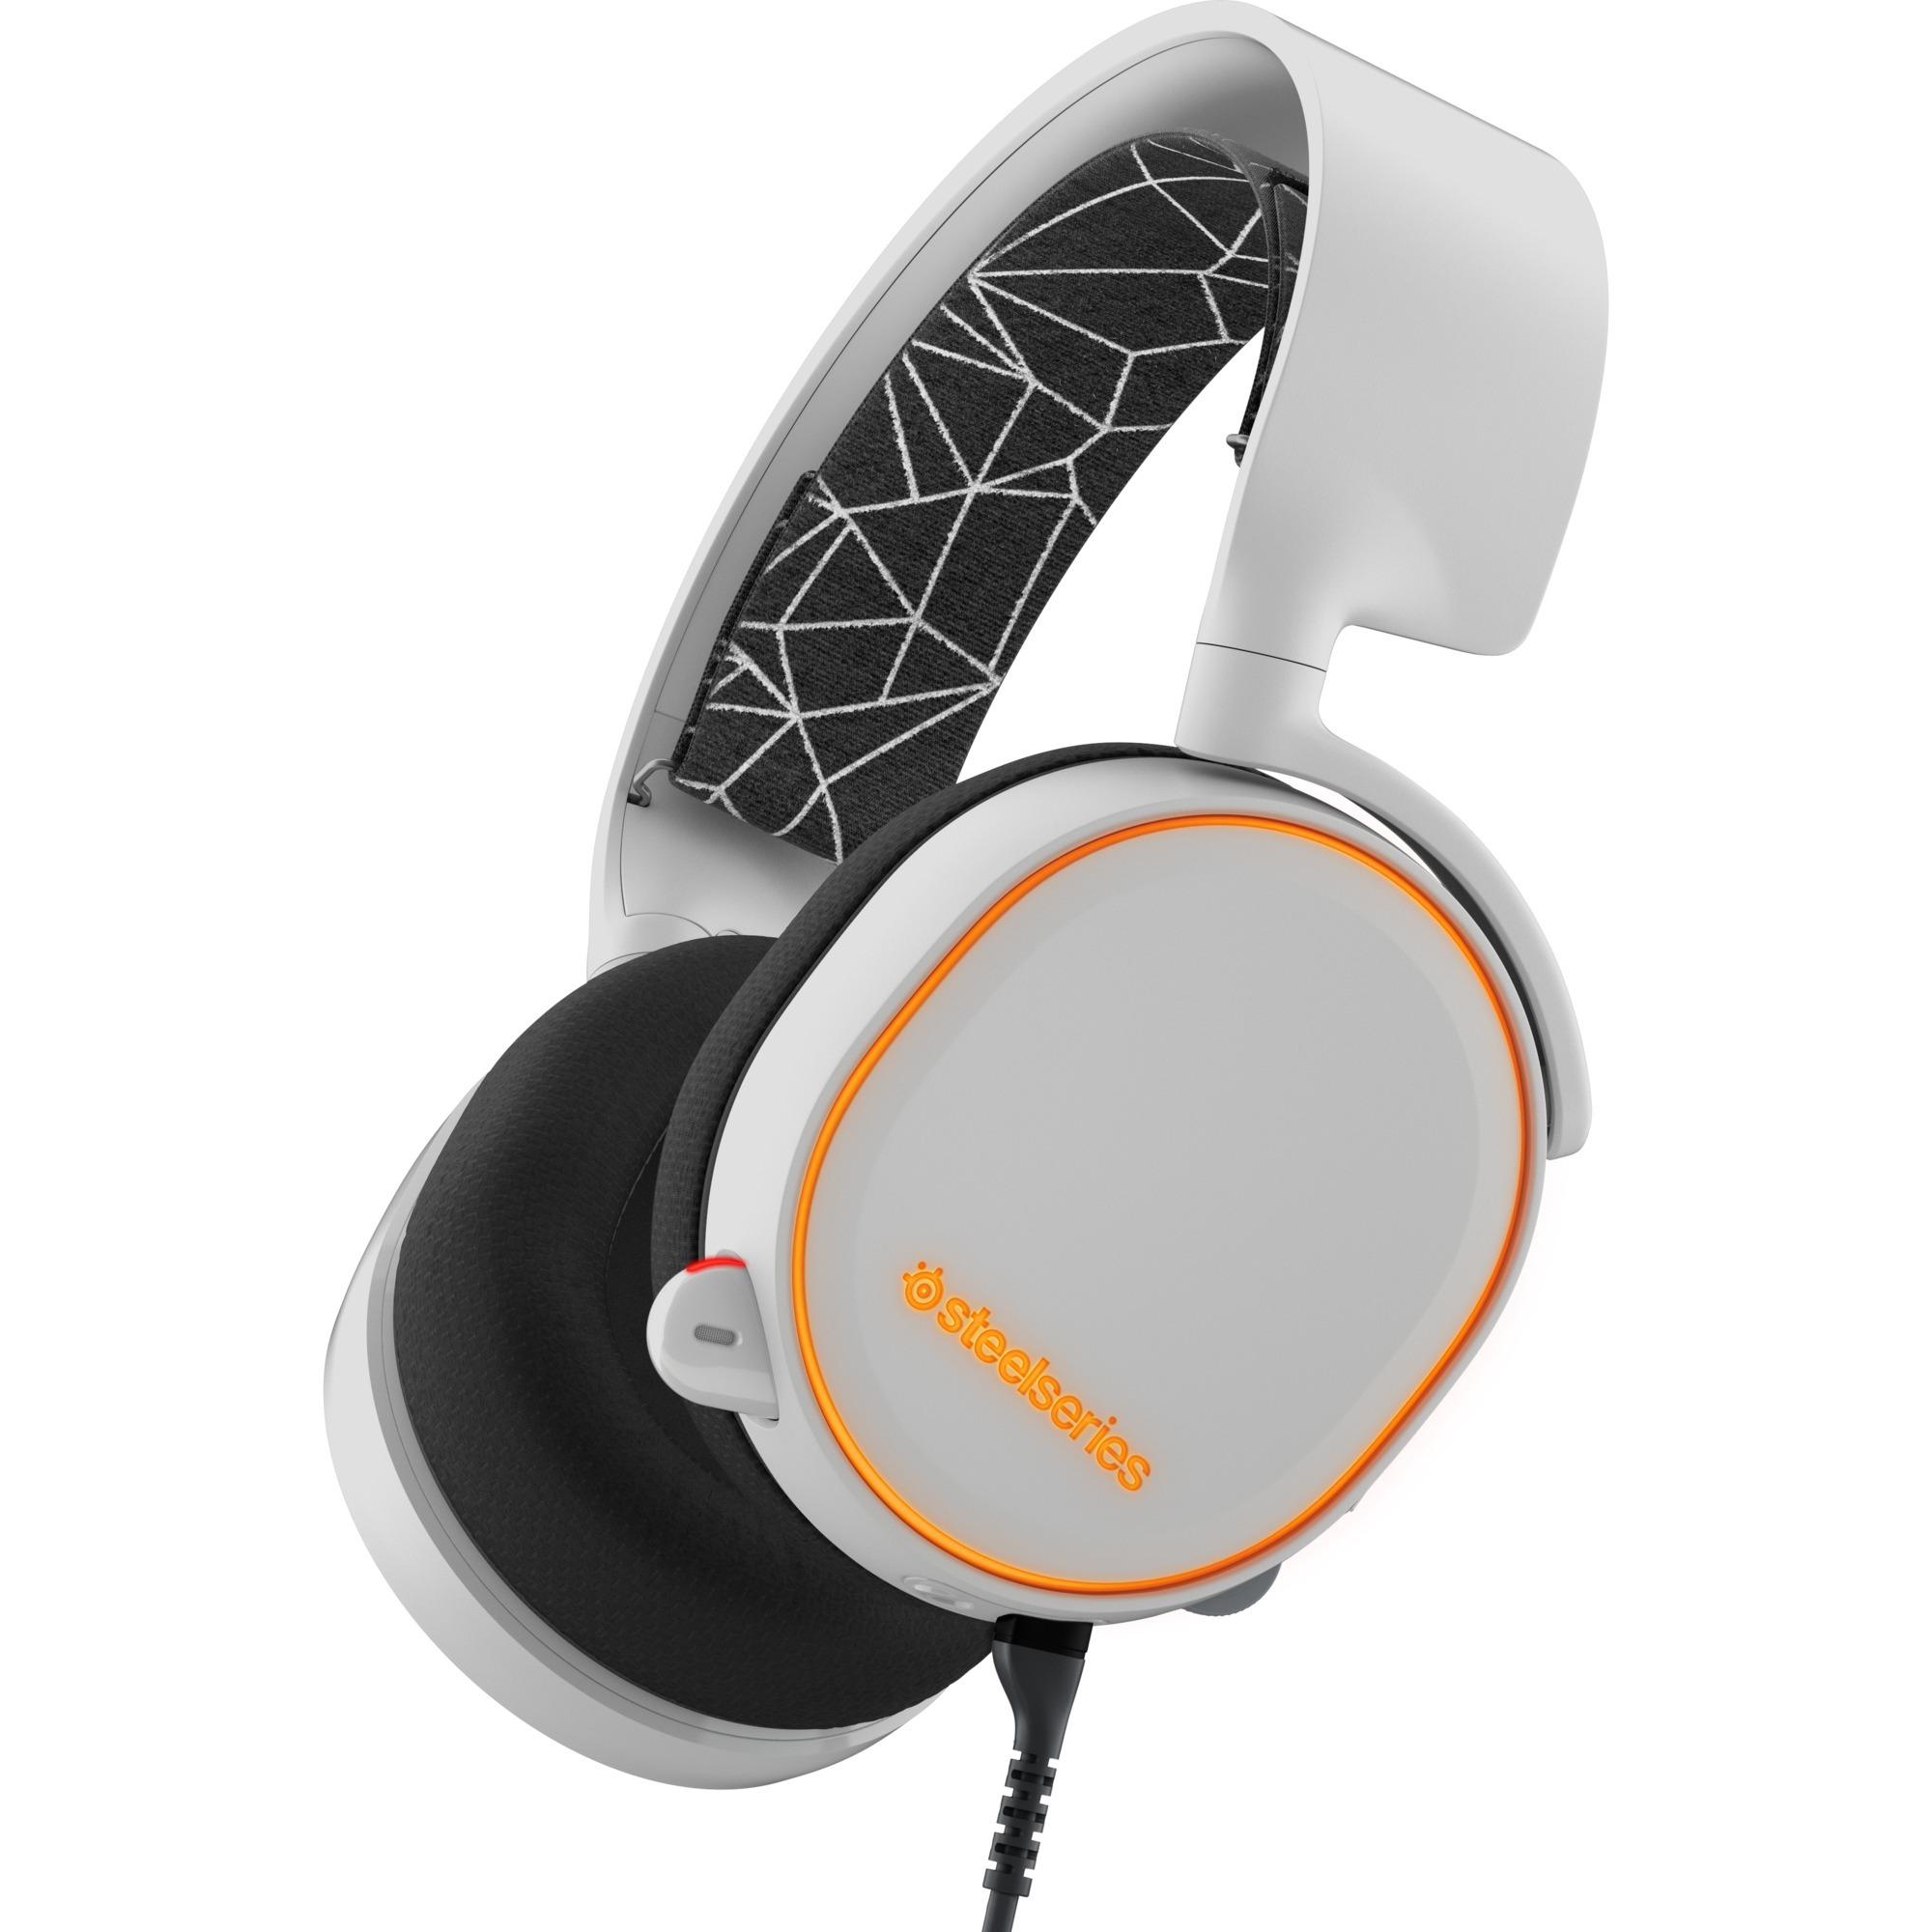 Arctis 5 Binaurale Diadema Negro, Blanco auricular con micrófono, Auriculares con micrófono